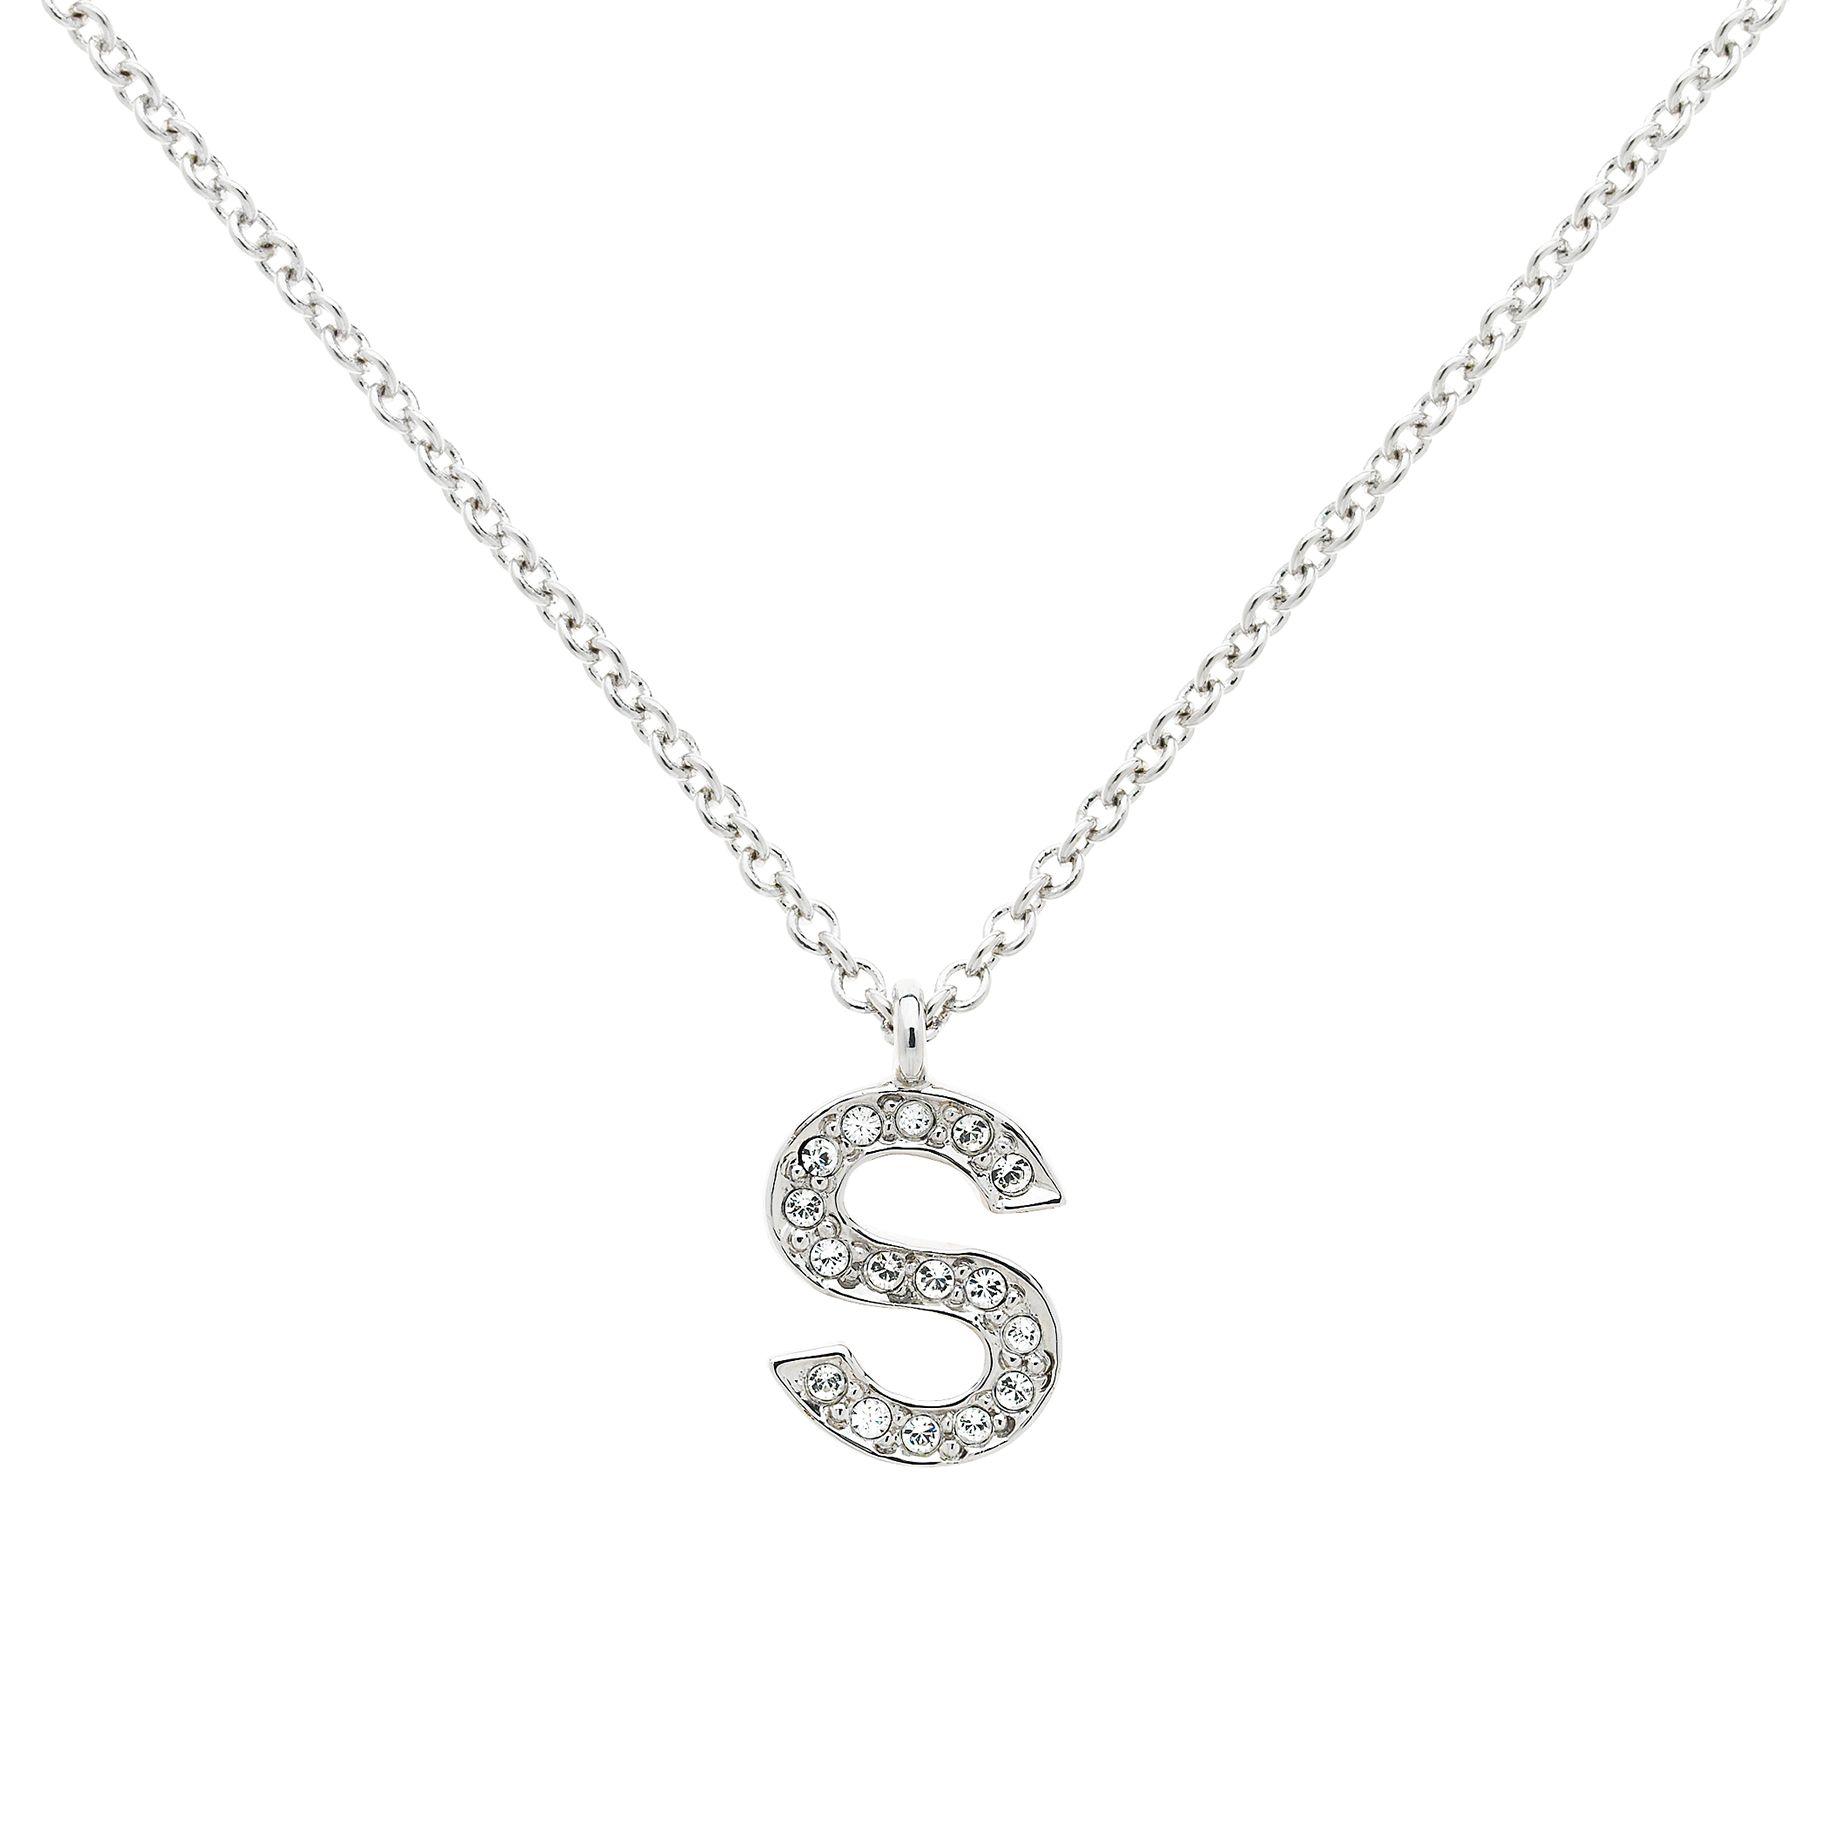 Melissa Odabash Melissa Odabash Swarovski Crystal Initial Pendant Necklace